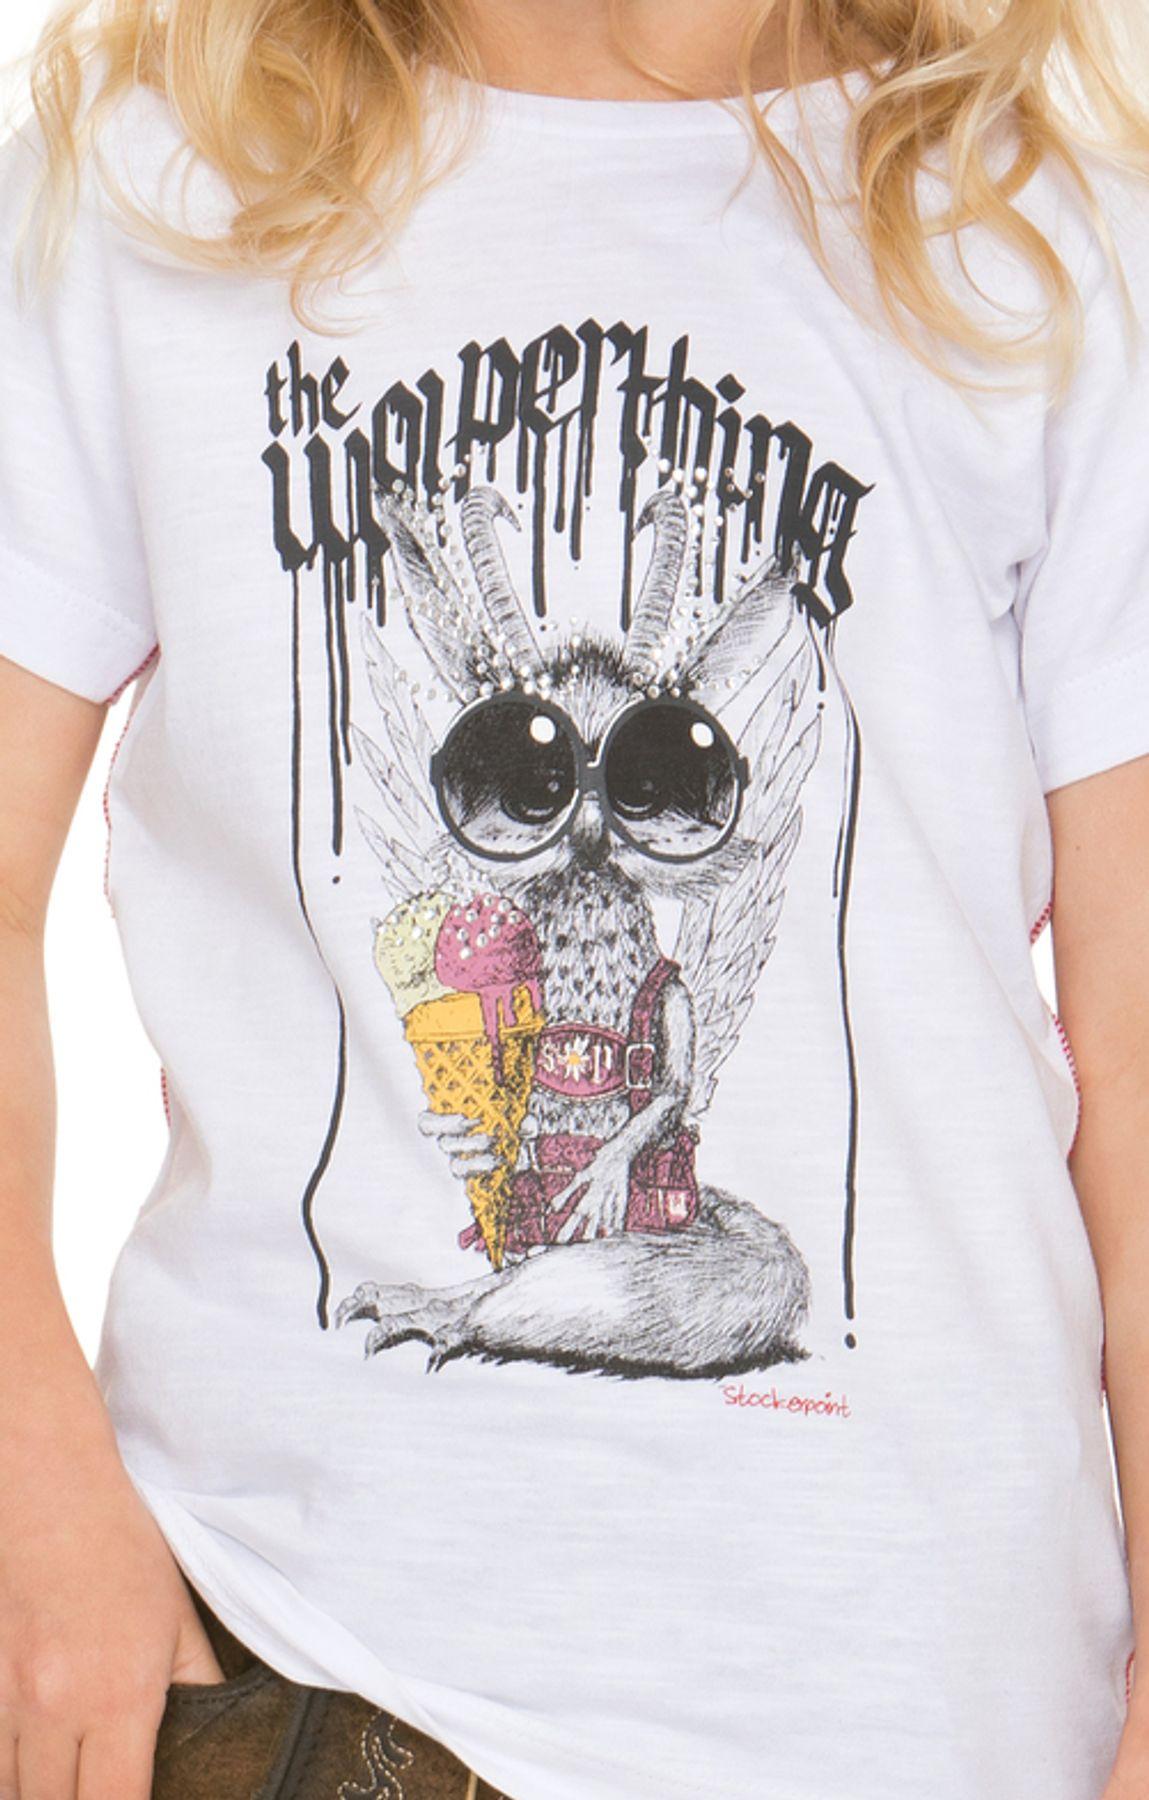 Stockerpoint - Kinder Trachten T-Shirt Wolpigirl, Gr. 86-140 – Bild 11